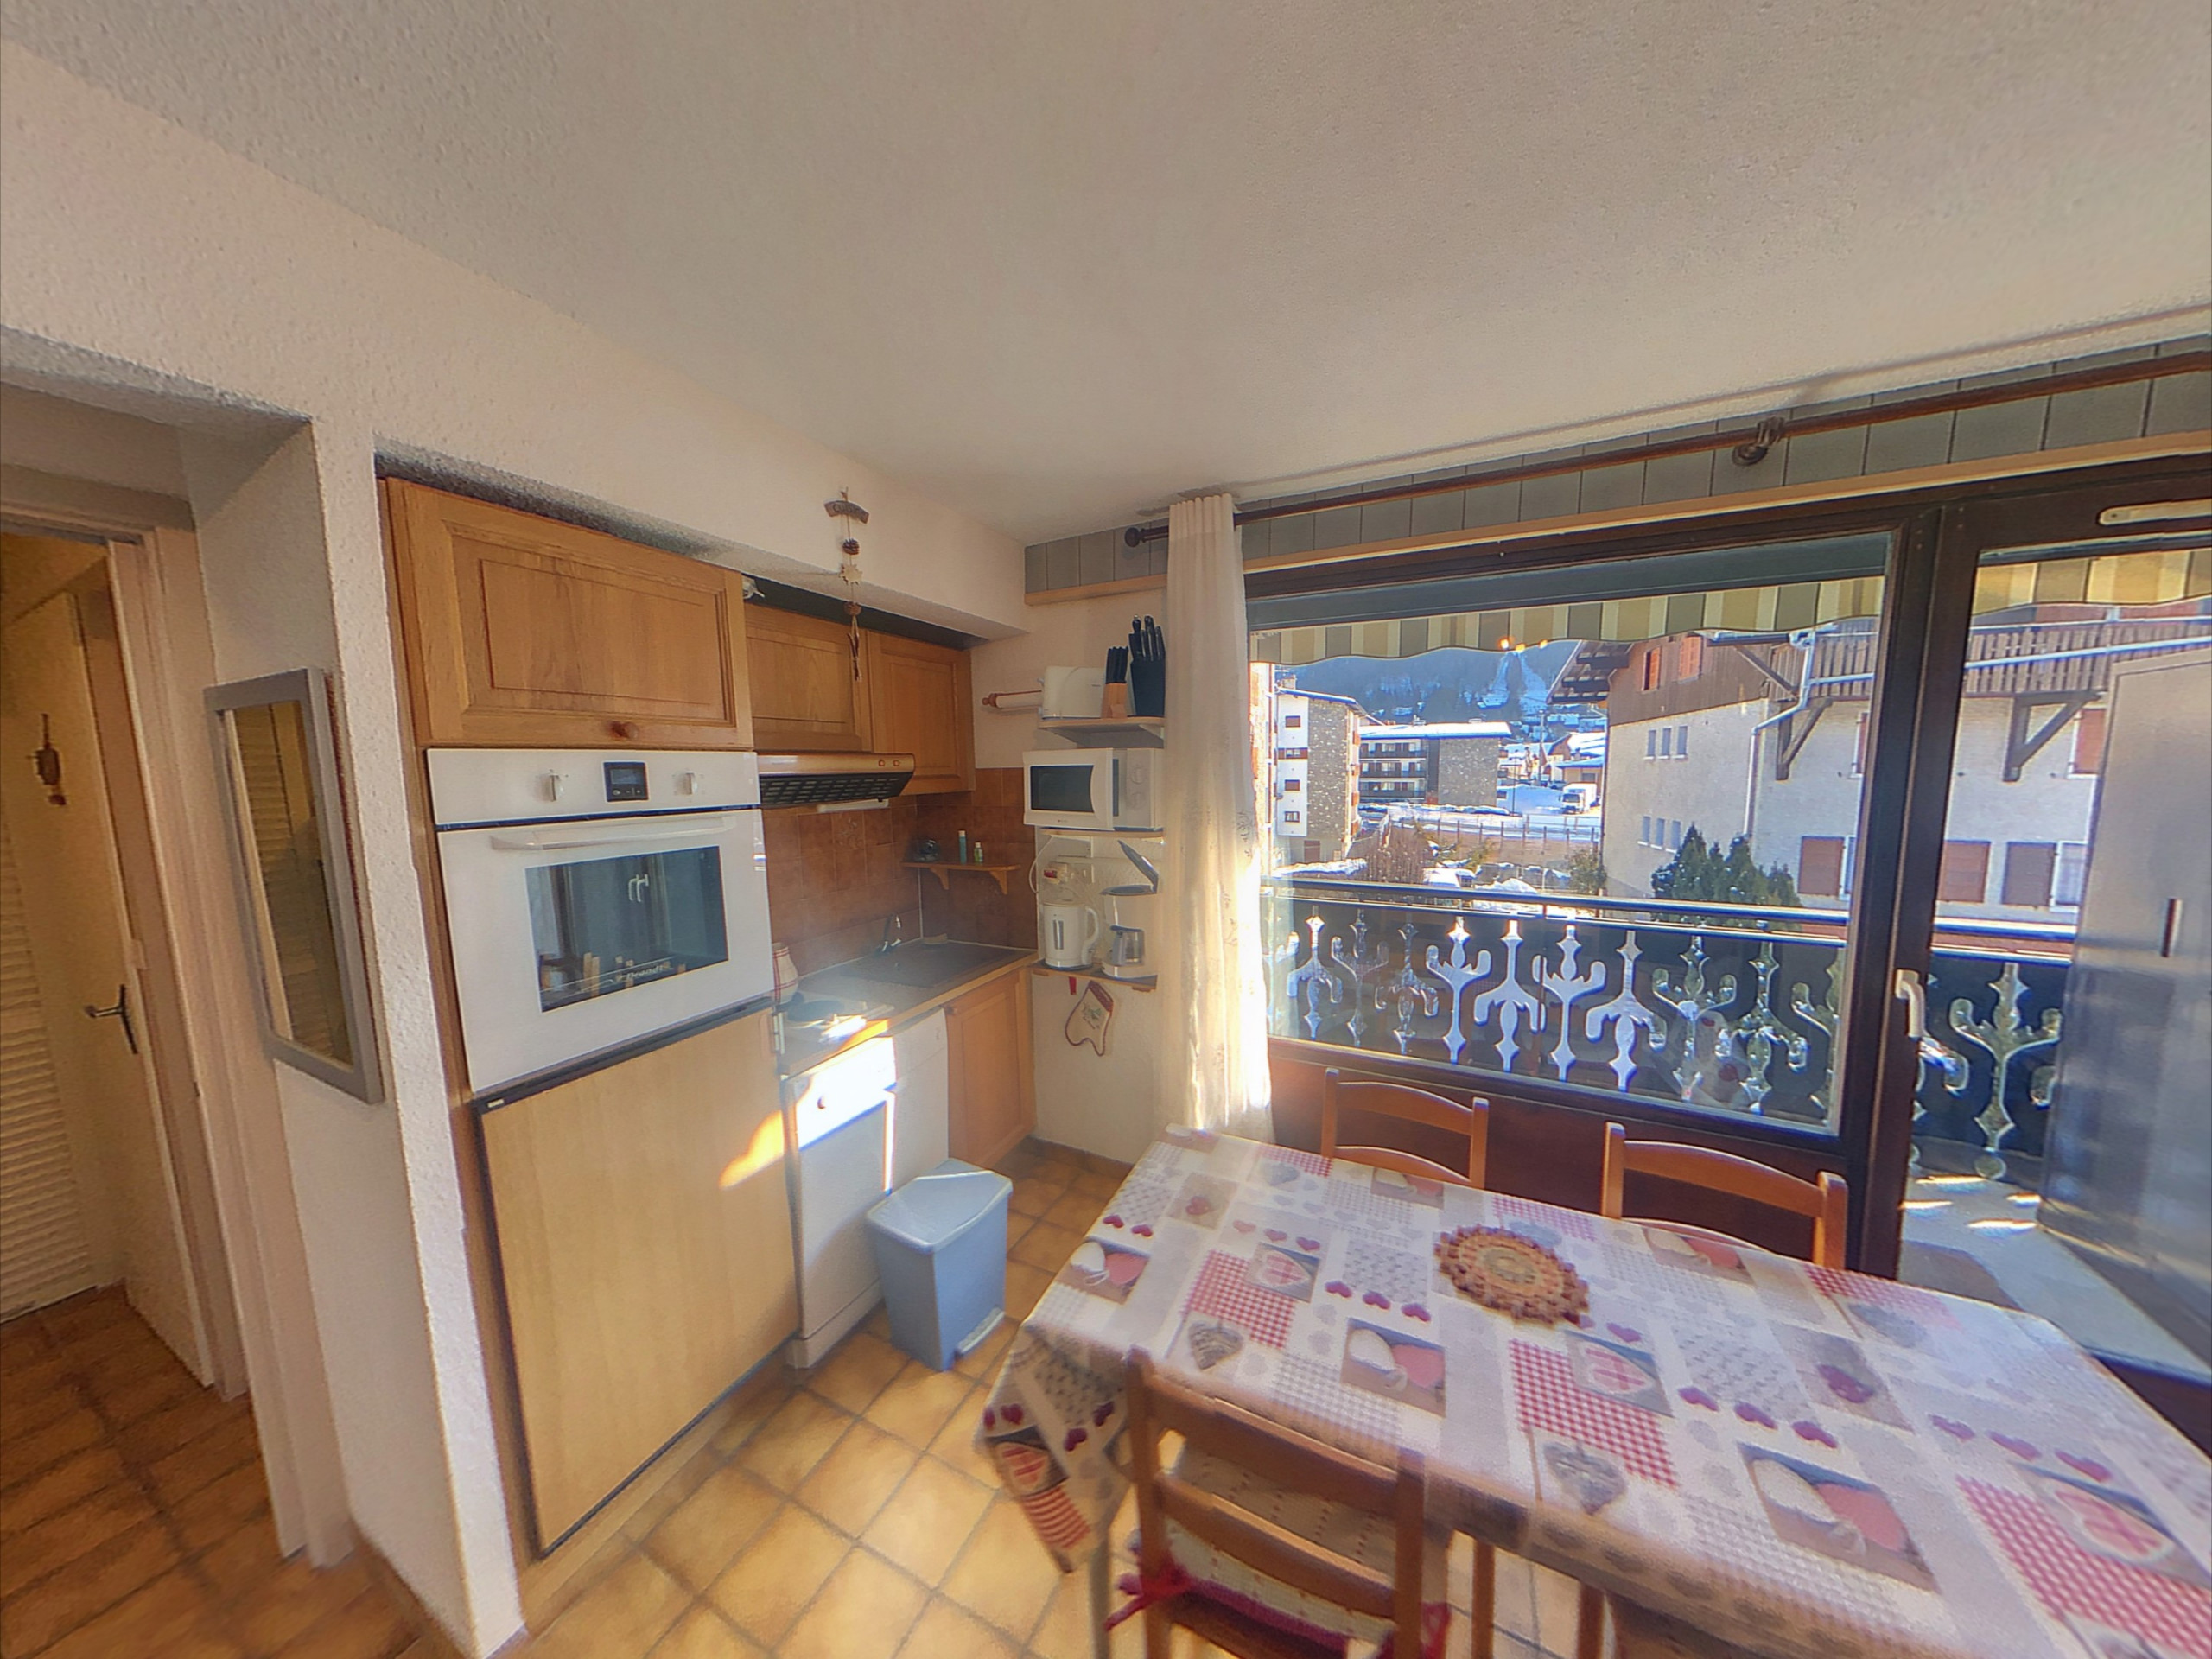 CA228 - Studio  4/5 Pers centre des Carroz Accommodation in Les Carroz